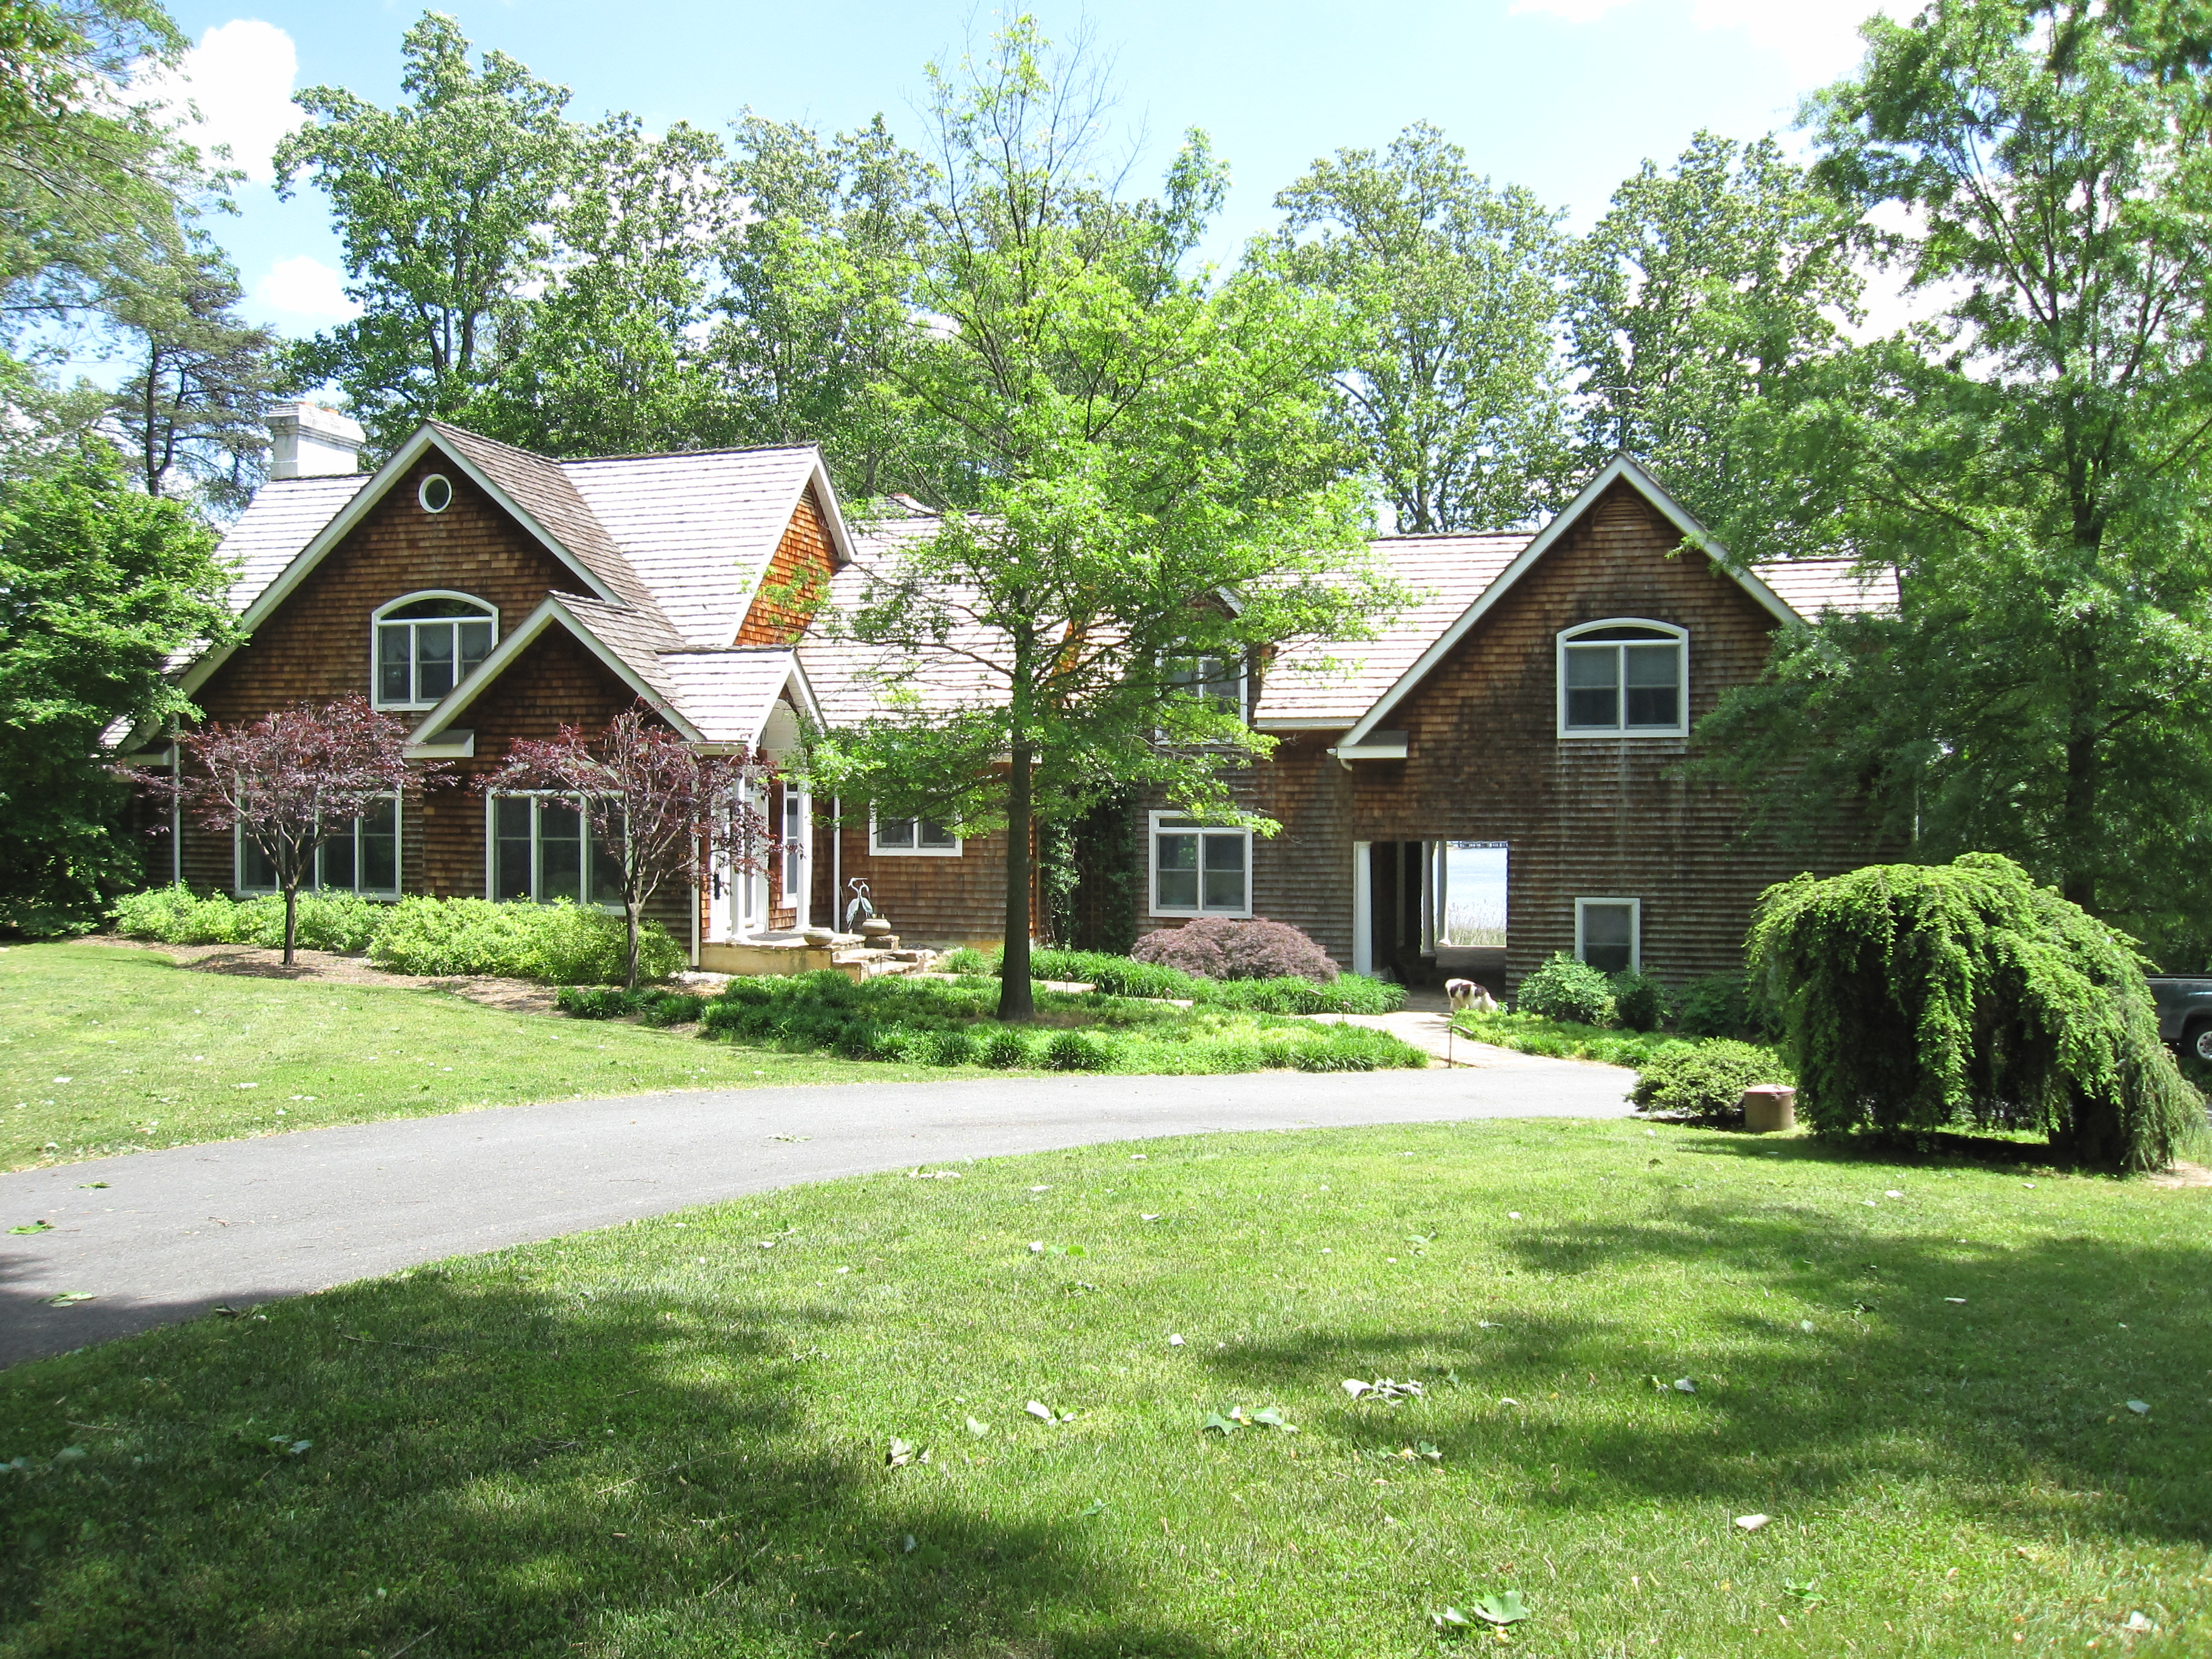 275 Hall Creek Dr Sassafras River Waterfront Home in Earleville MD